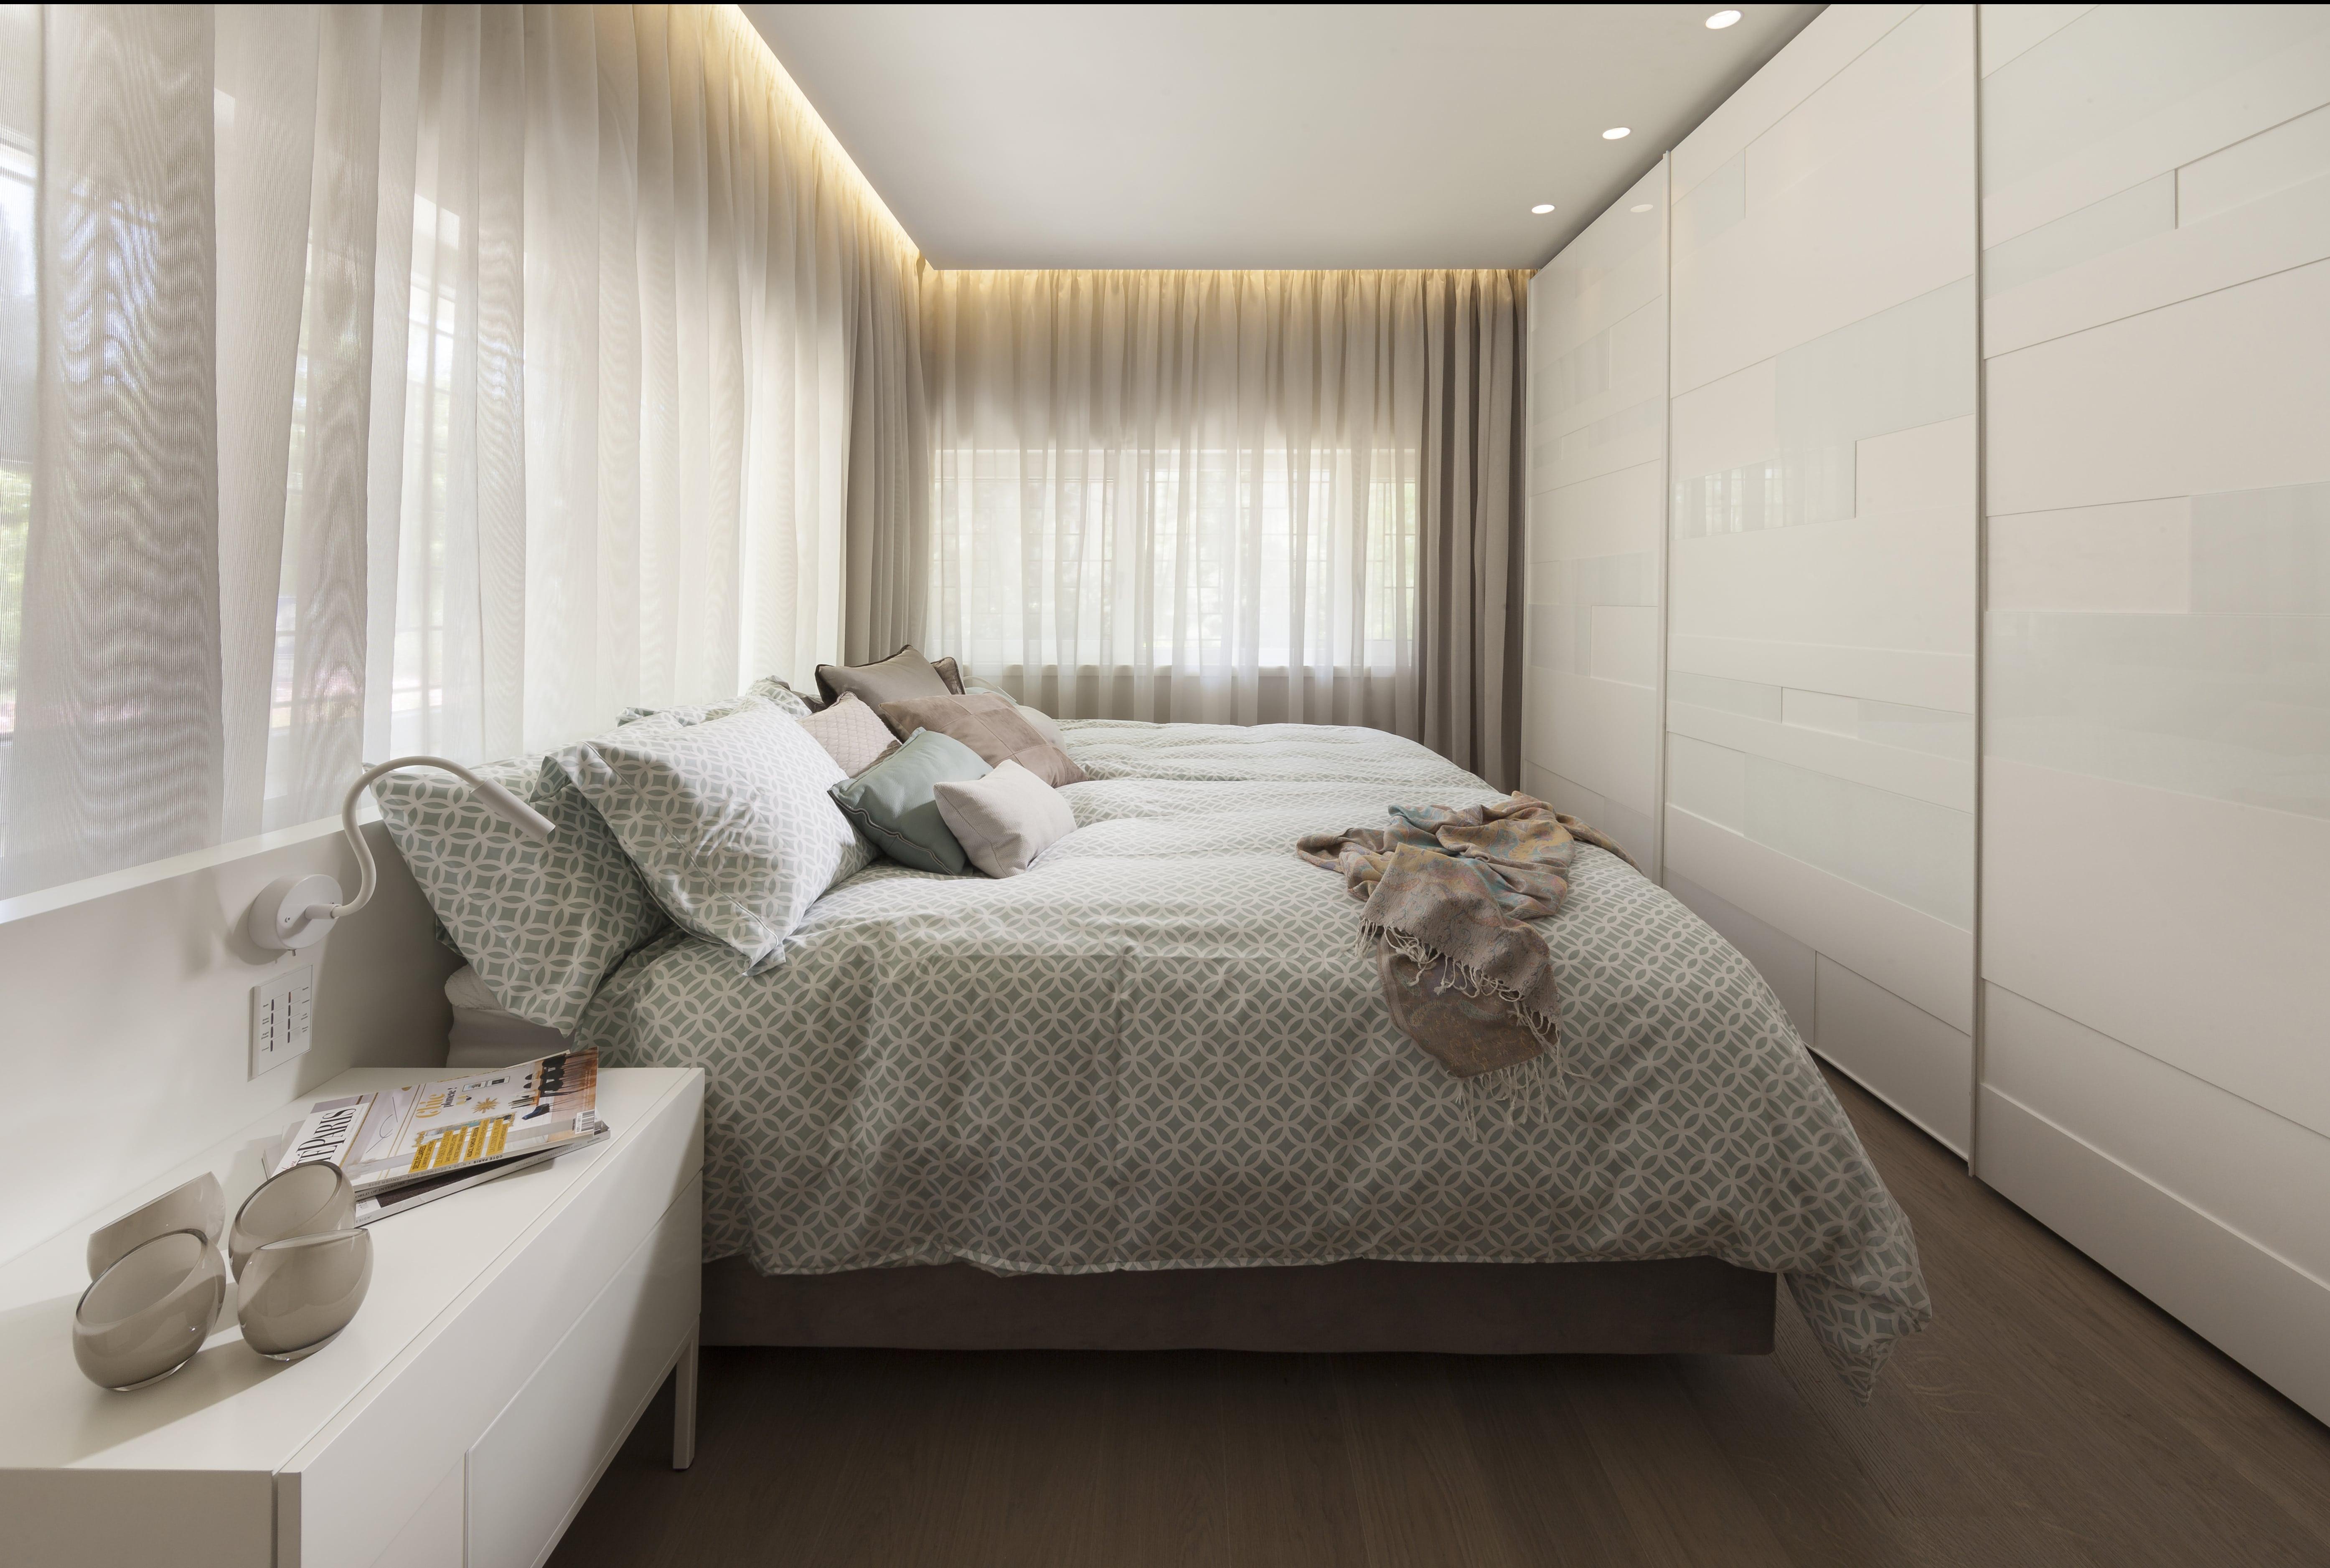 guest_bedroom_after-min.jpg